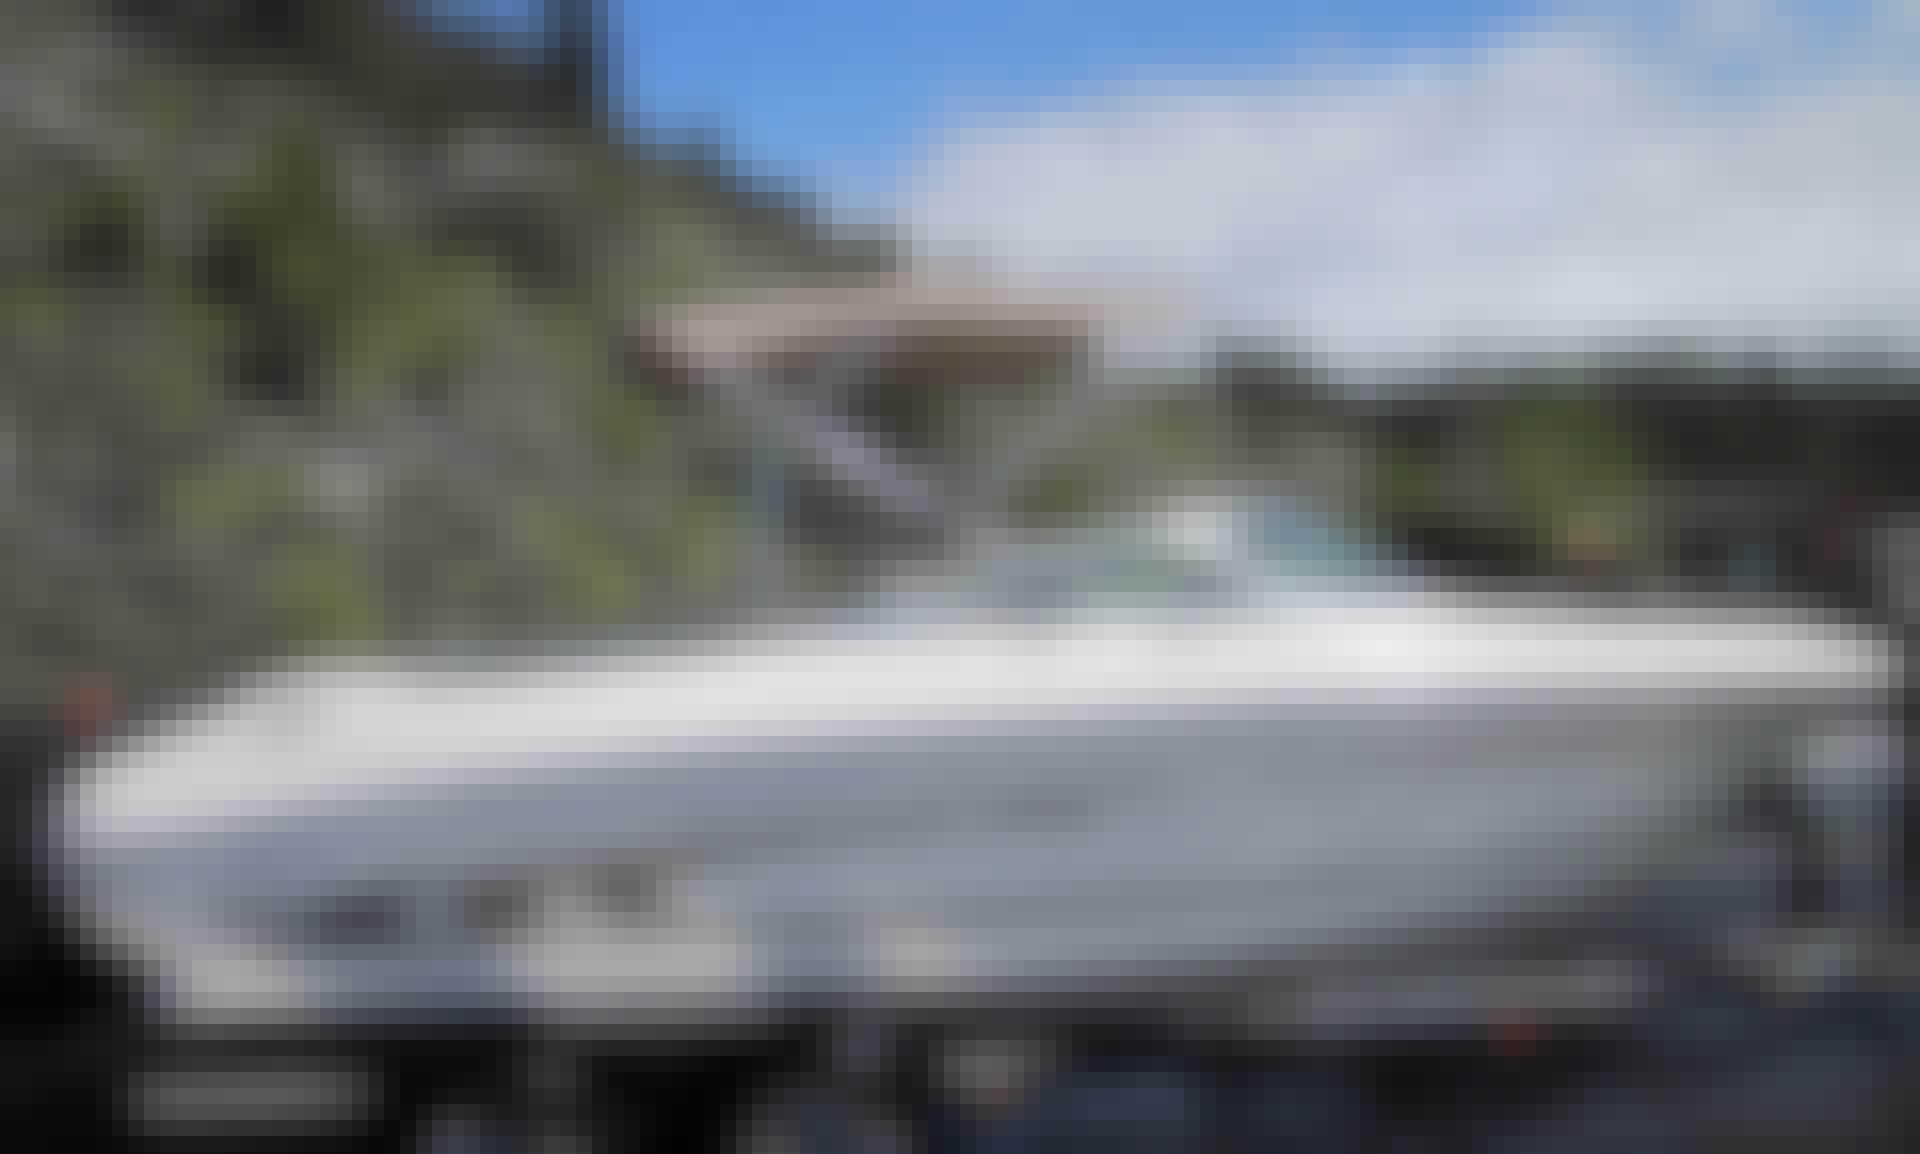 21' Sea Ray Bowrider Rental in Glenbrook, Nevada